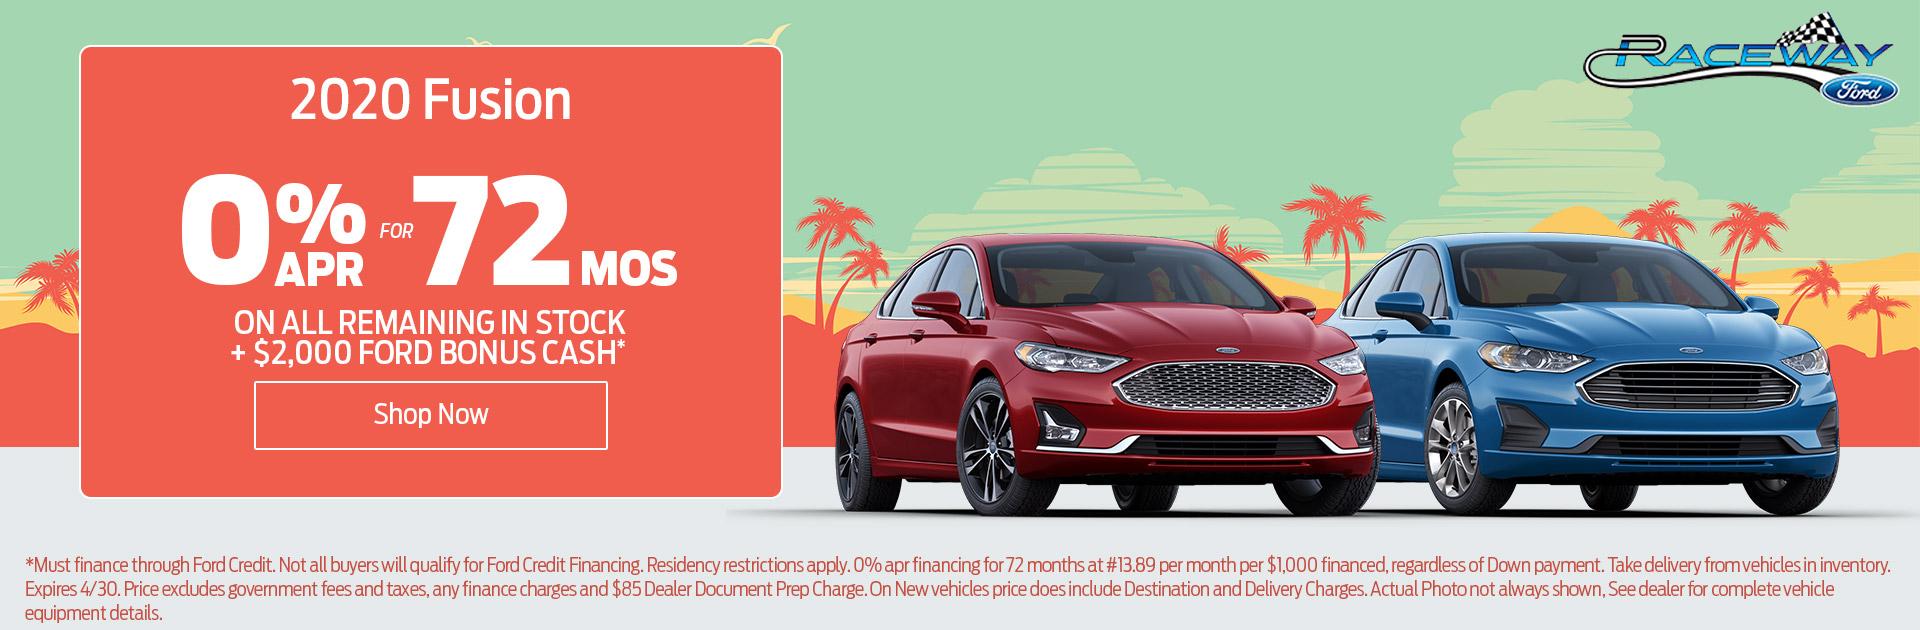 April 040921 Fusion Retail Offer